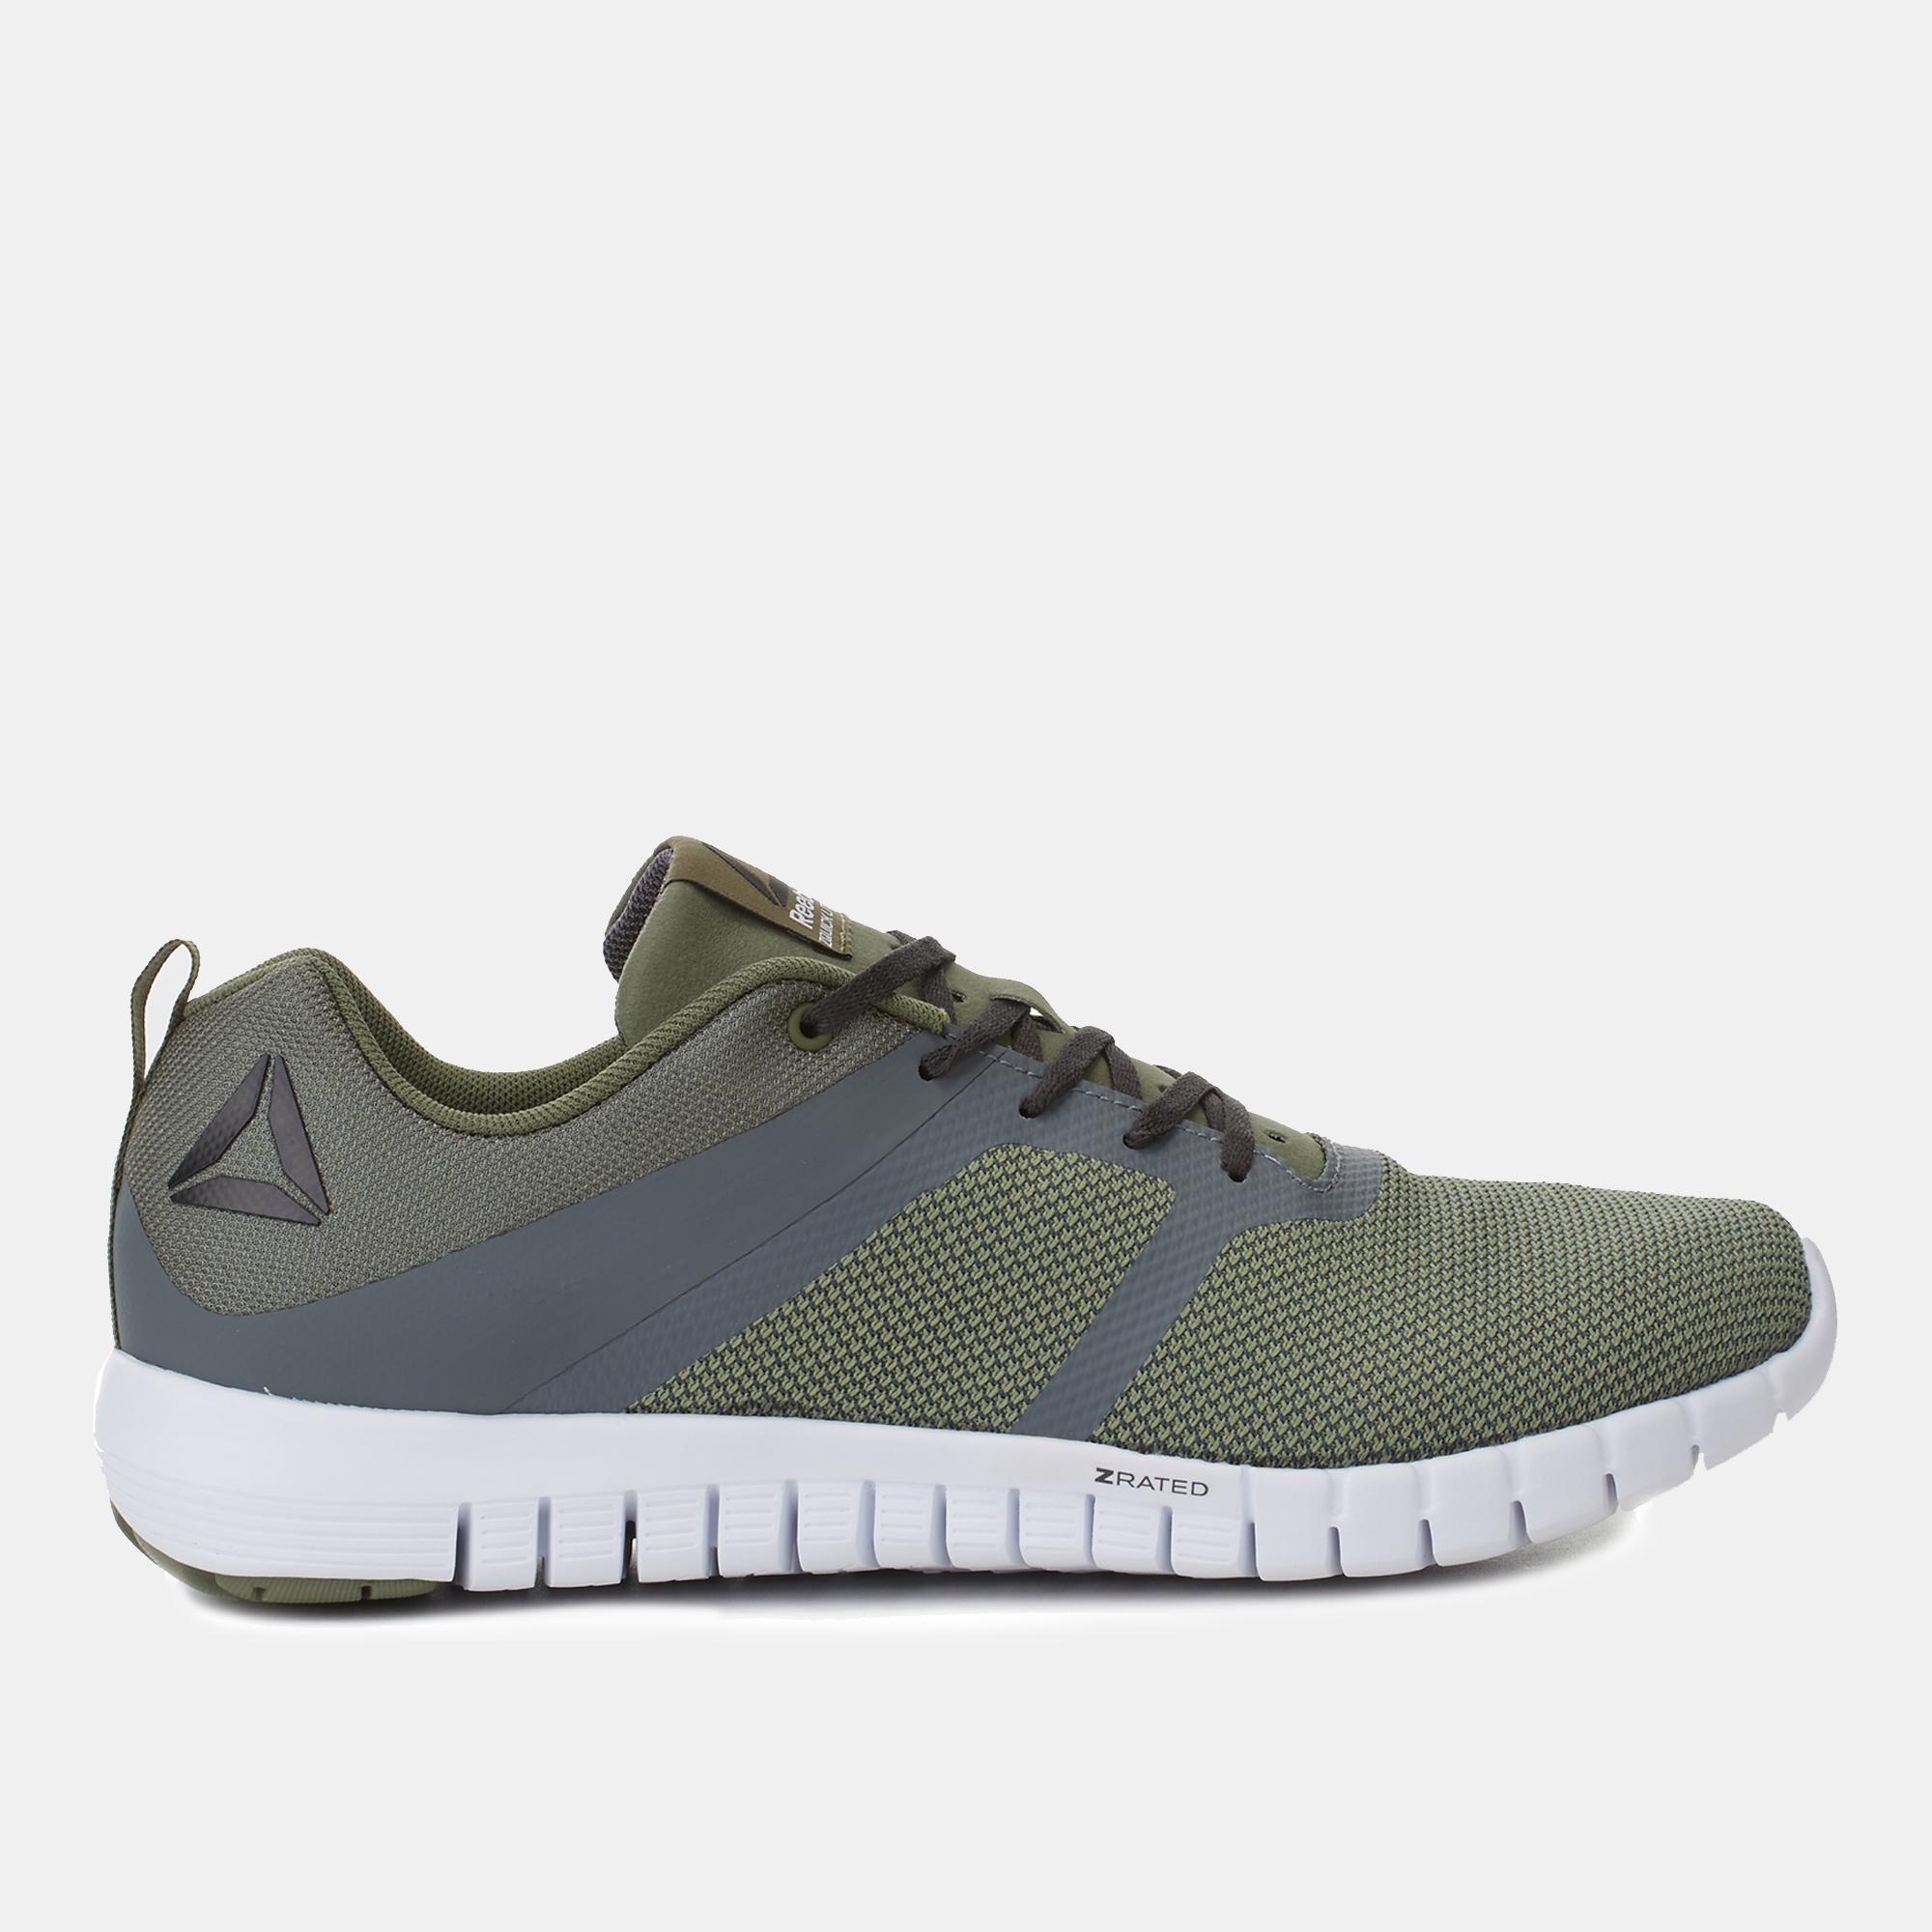 b82182f3f30dee Reebok ZQuick Lite 2.0 Shoe